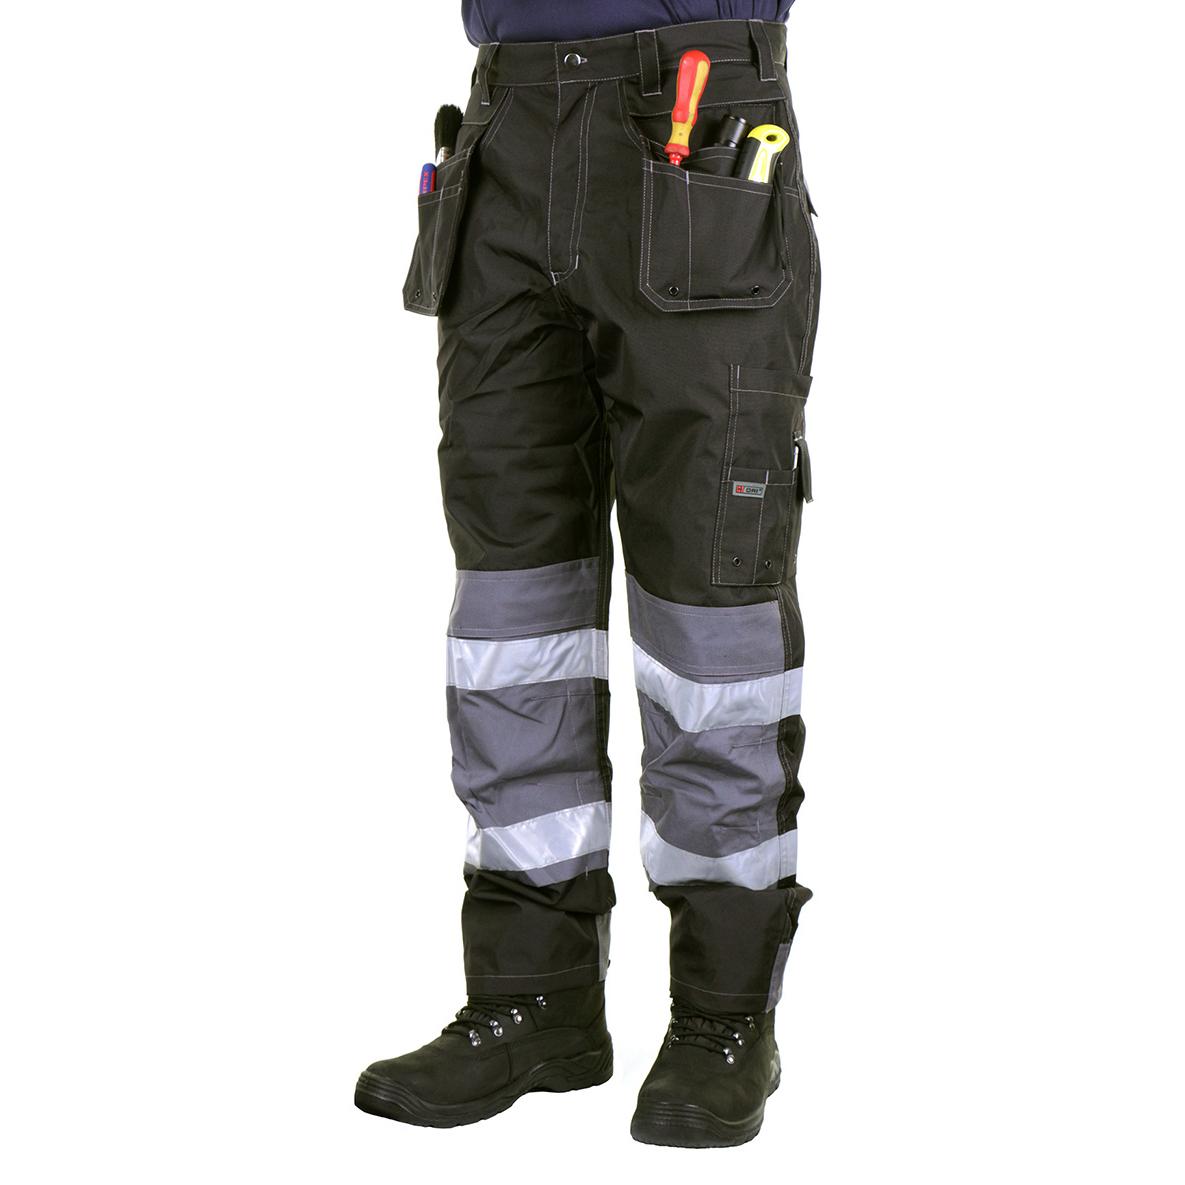 B-Dri Weatherproof Banbury Trousers Multi-pocket Black 30-Tall Ref BTBL30T *Up to 3 Day Leadtime*